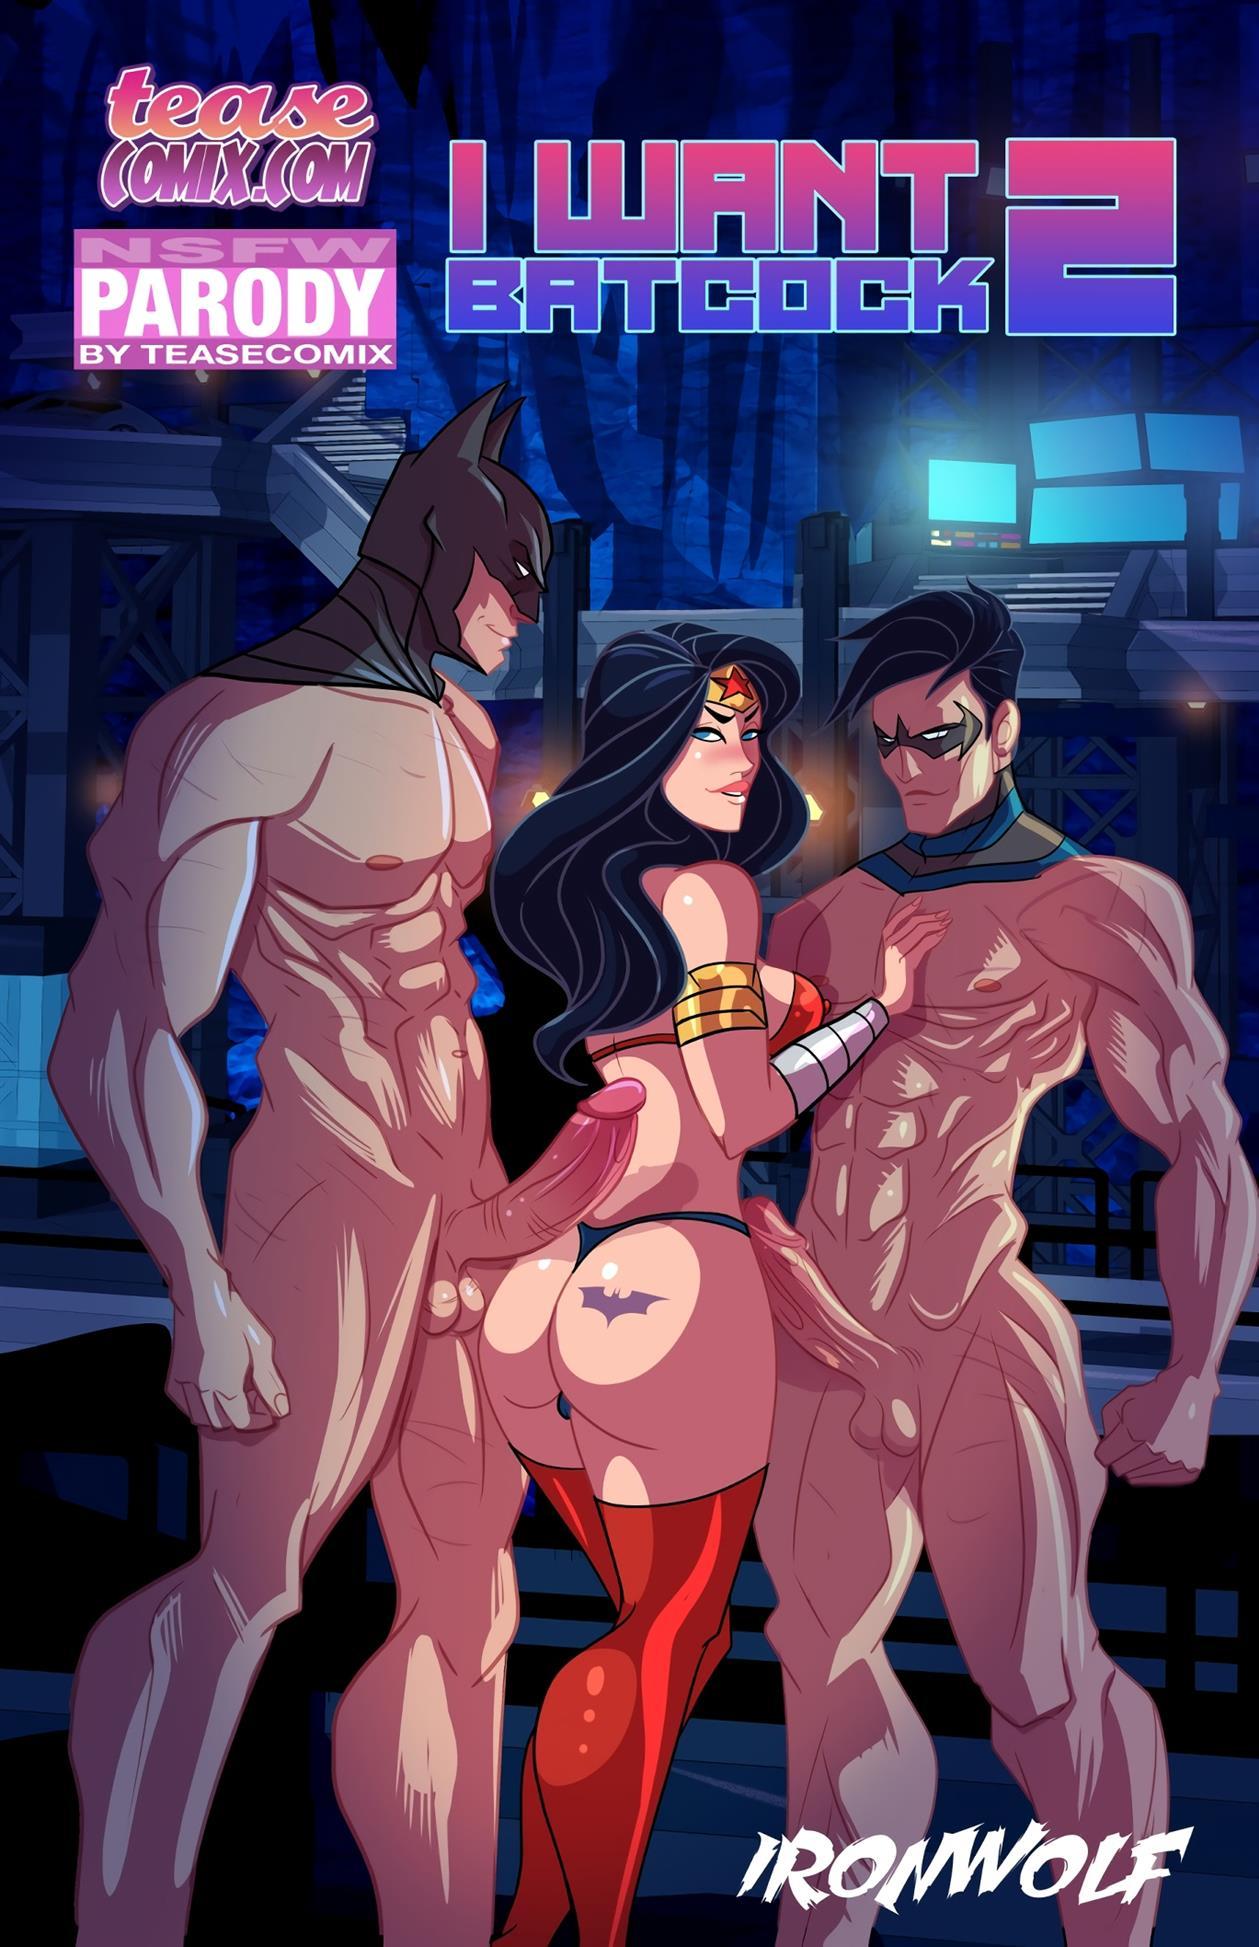 I Want Batcock 2 (Batman) [Tease Comix] - Foto 1